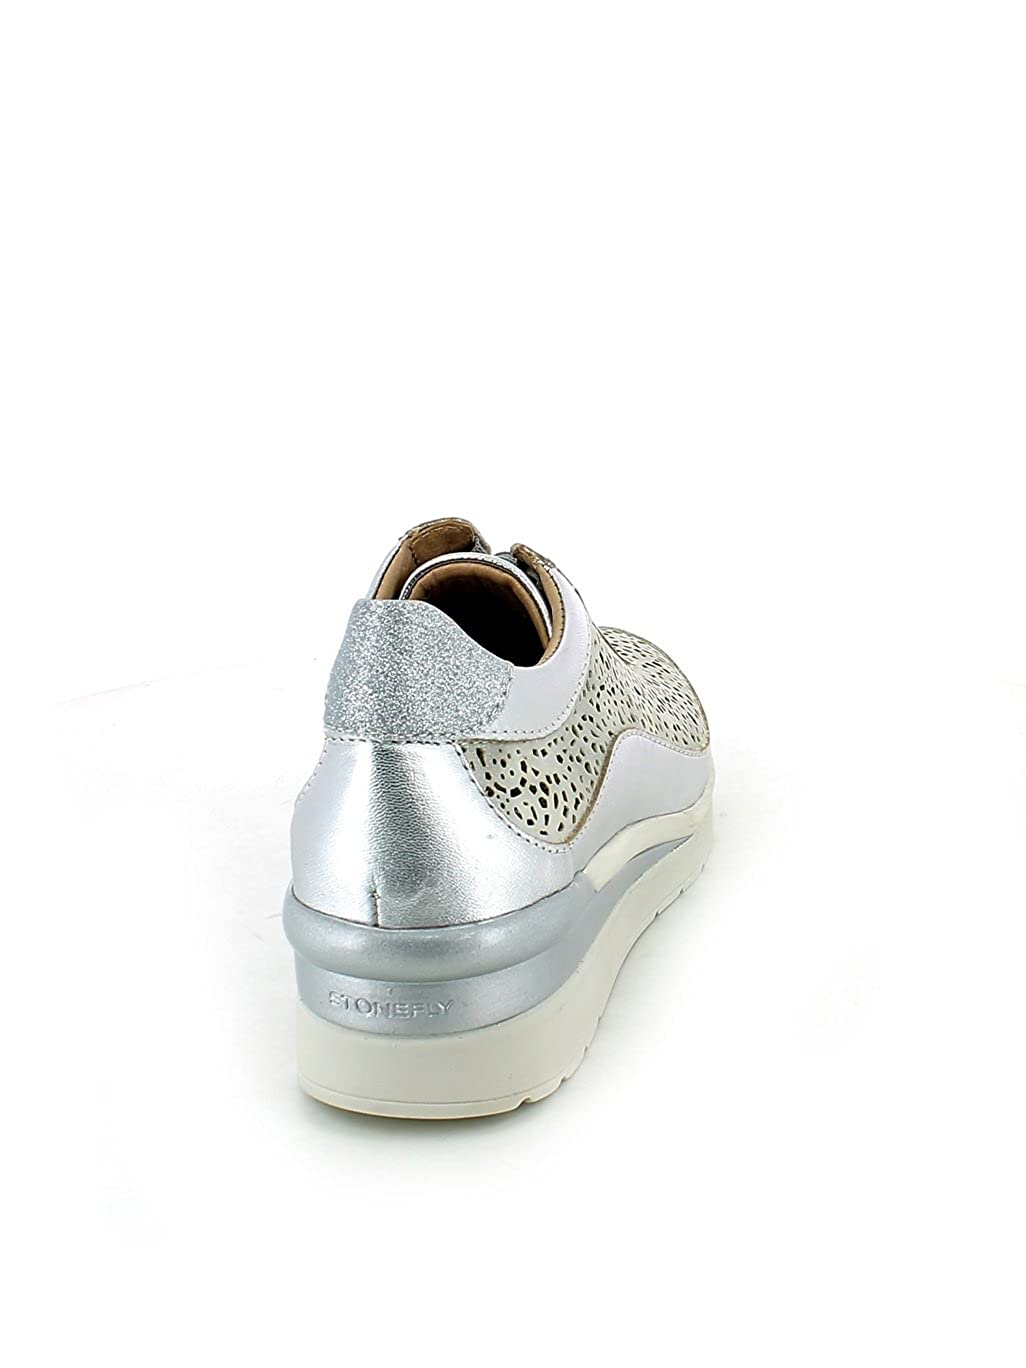 Stonefly Calzado Deportivo Para Mujer, Color Plateado, Marca, Modelo Modelo Modelo Calzado Deportivo Para Mujer Cream 2 Bis Plateado 926928